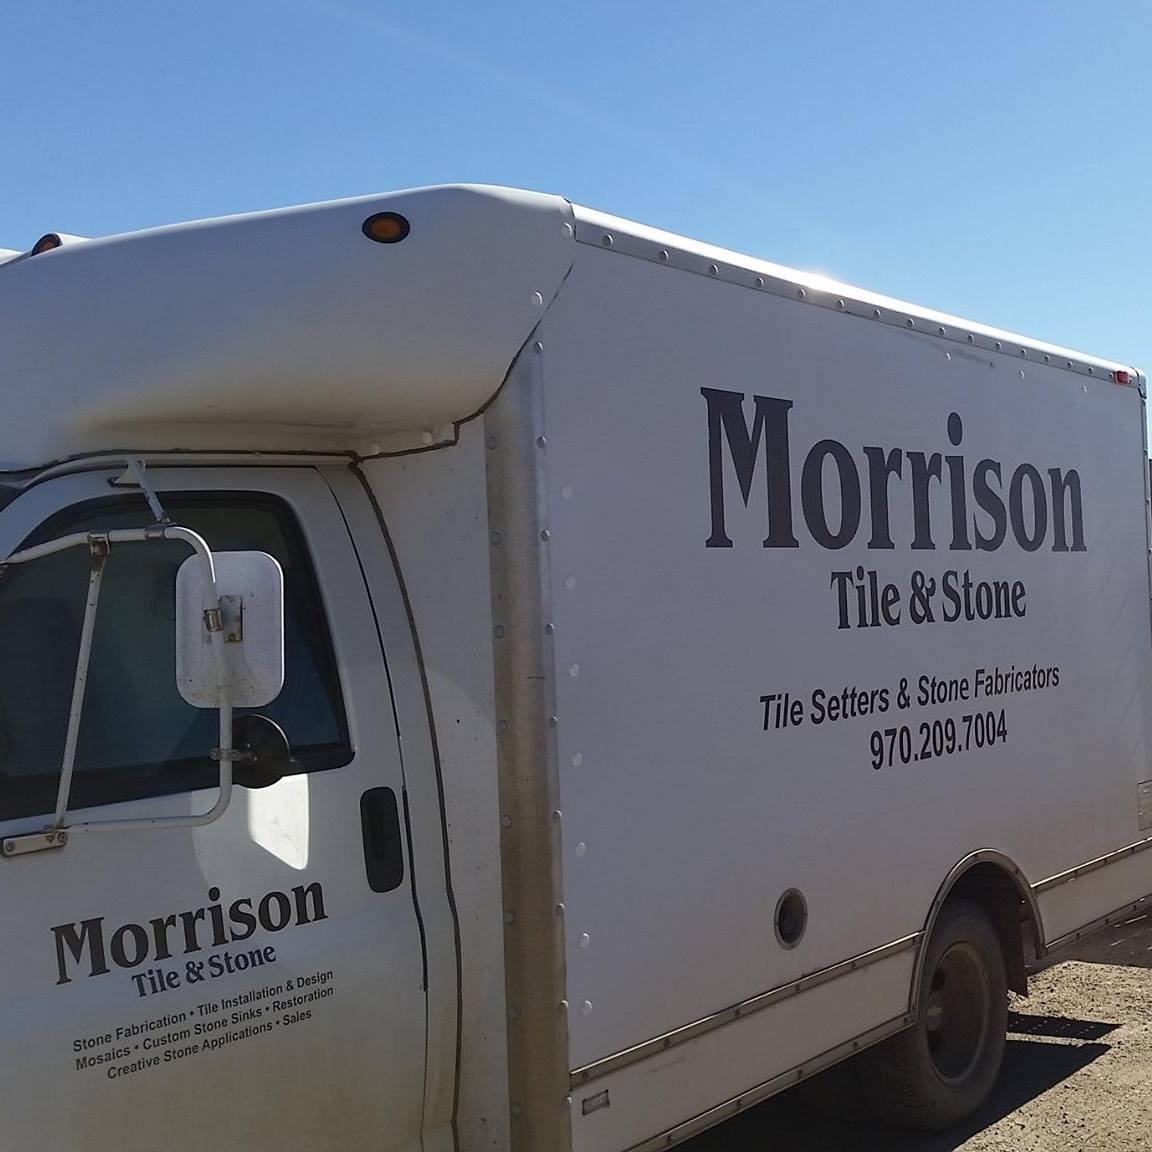 Morrison Tile & Stone